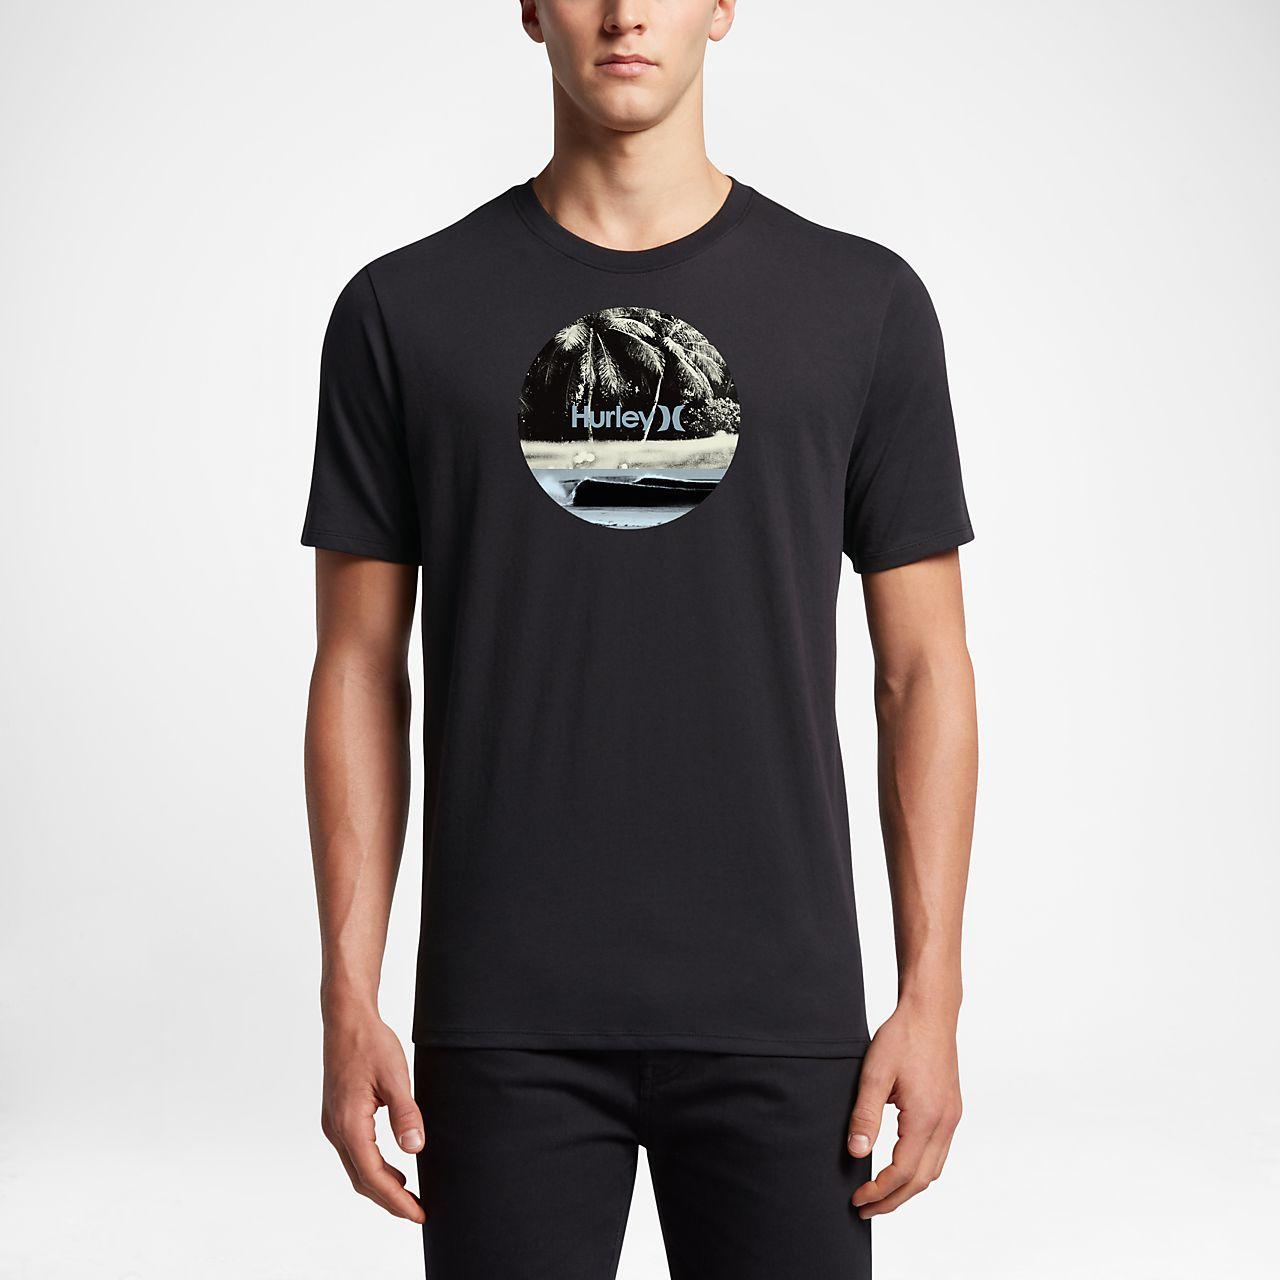 ... T-shirt Hurley Dri-FIT Lagoon - Uomo